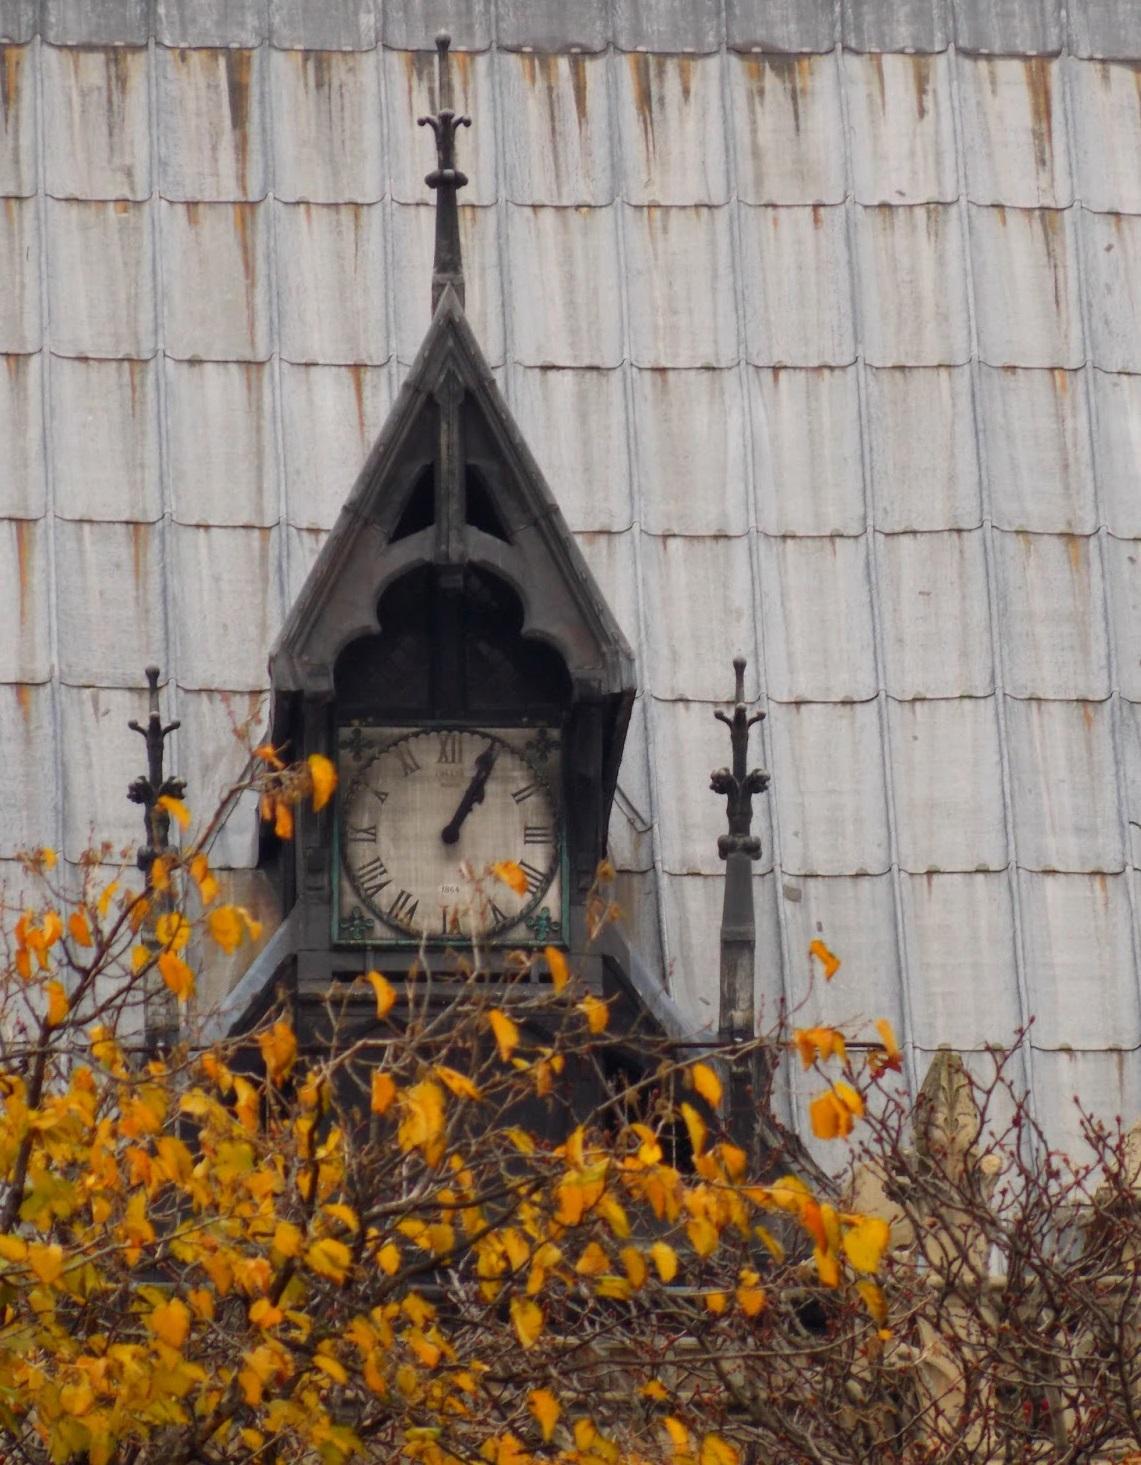 Horloge dos de Notre Dame de Paris